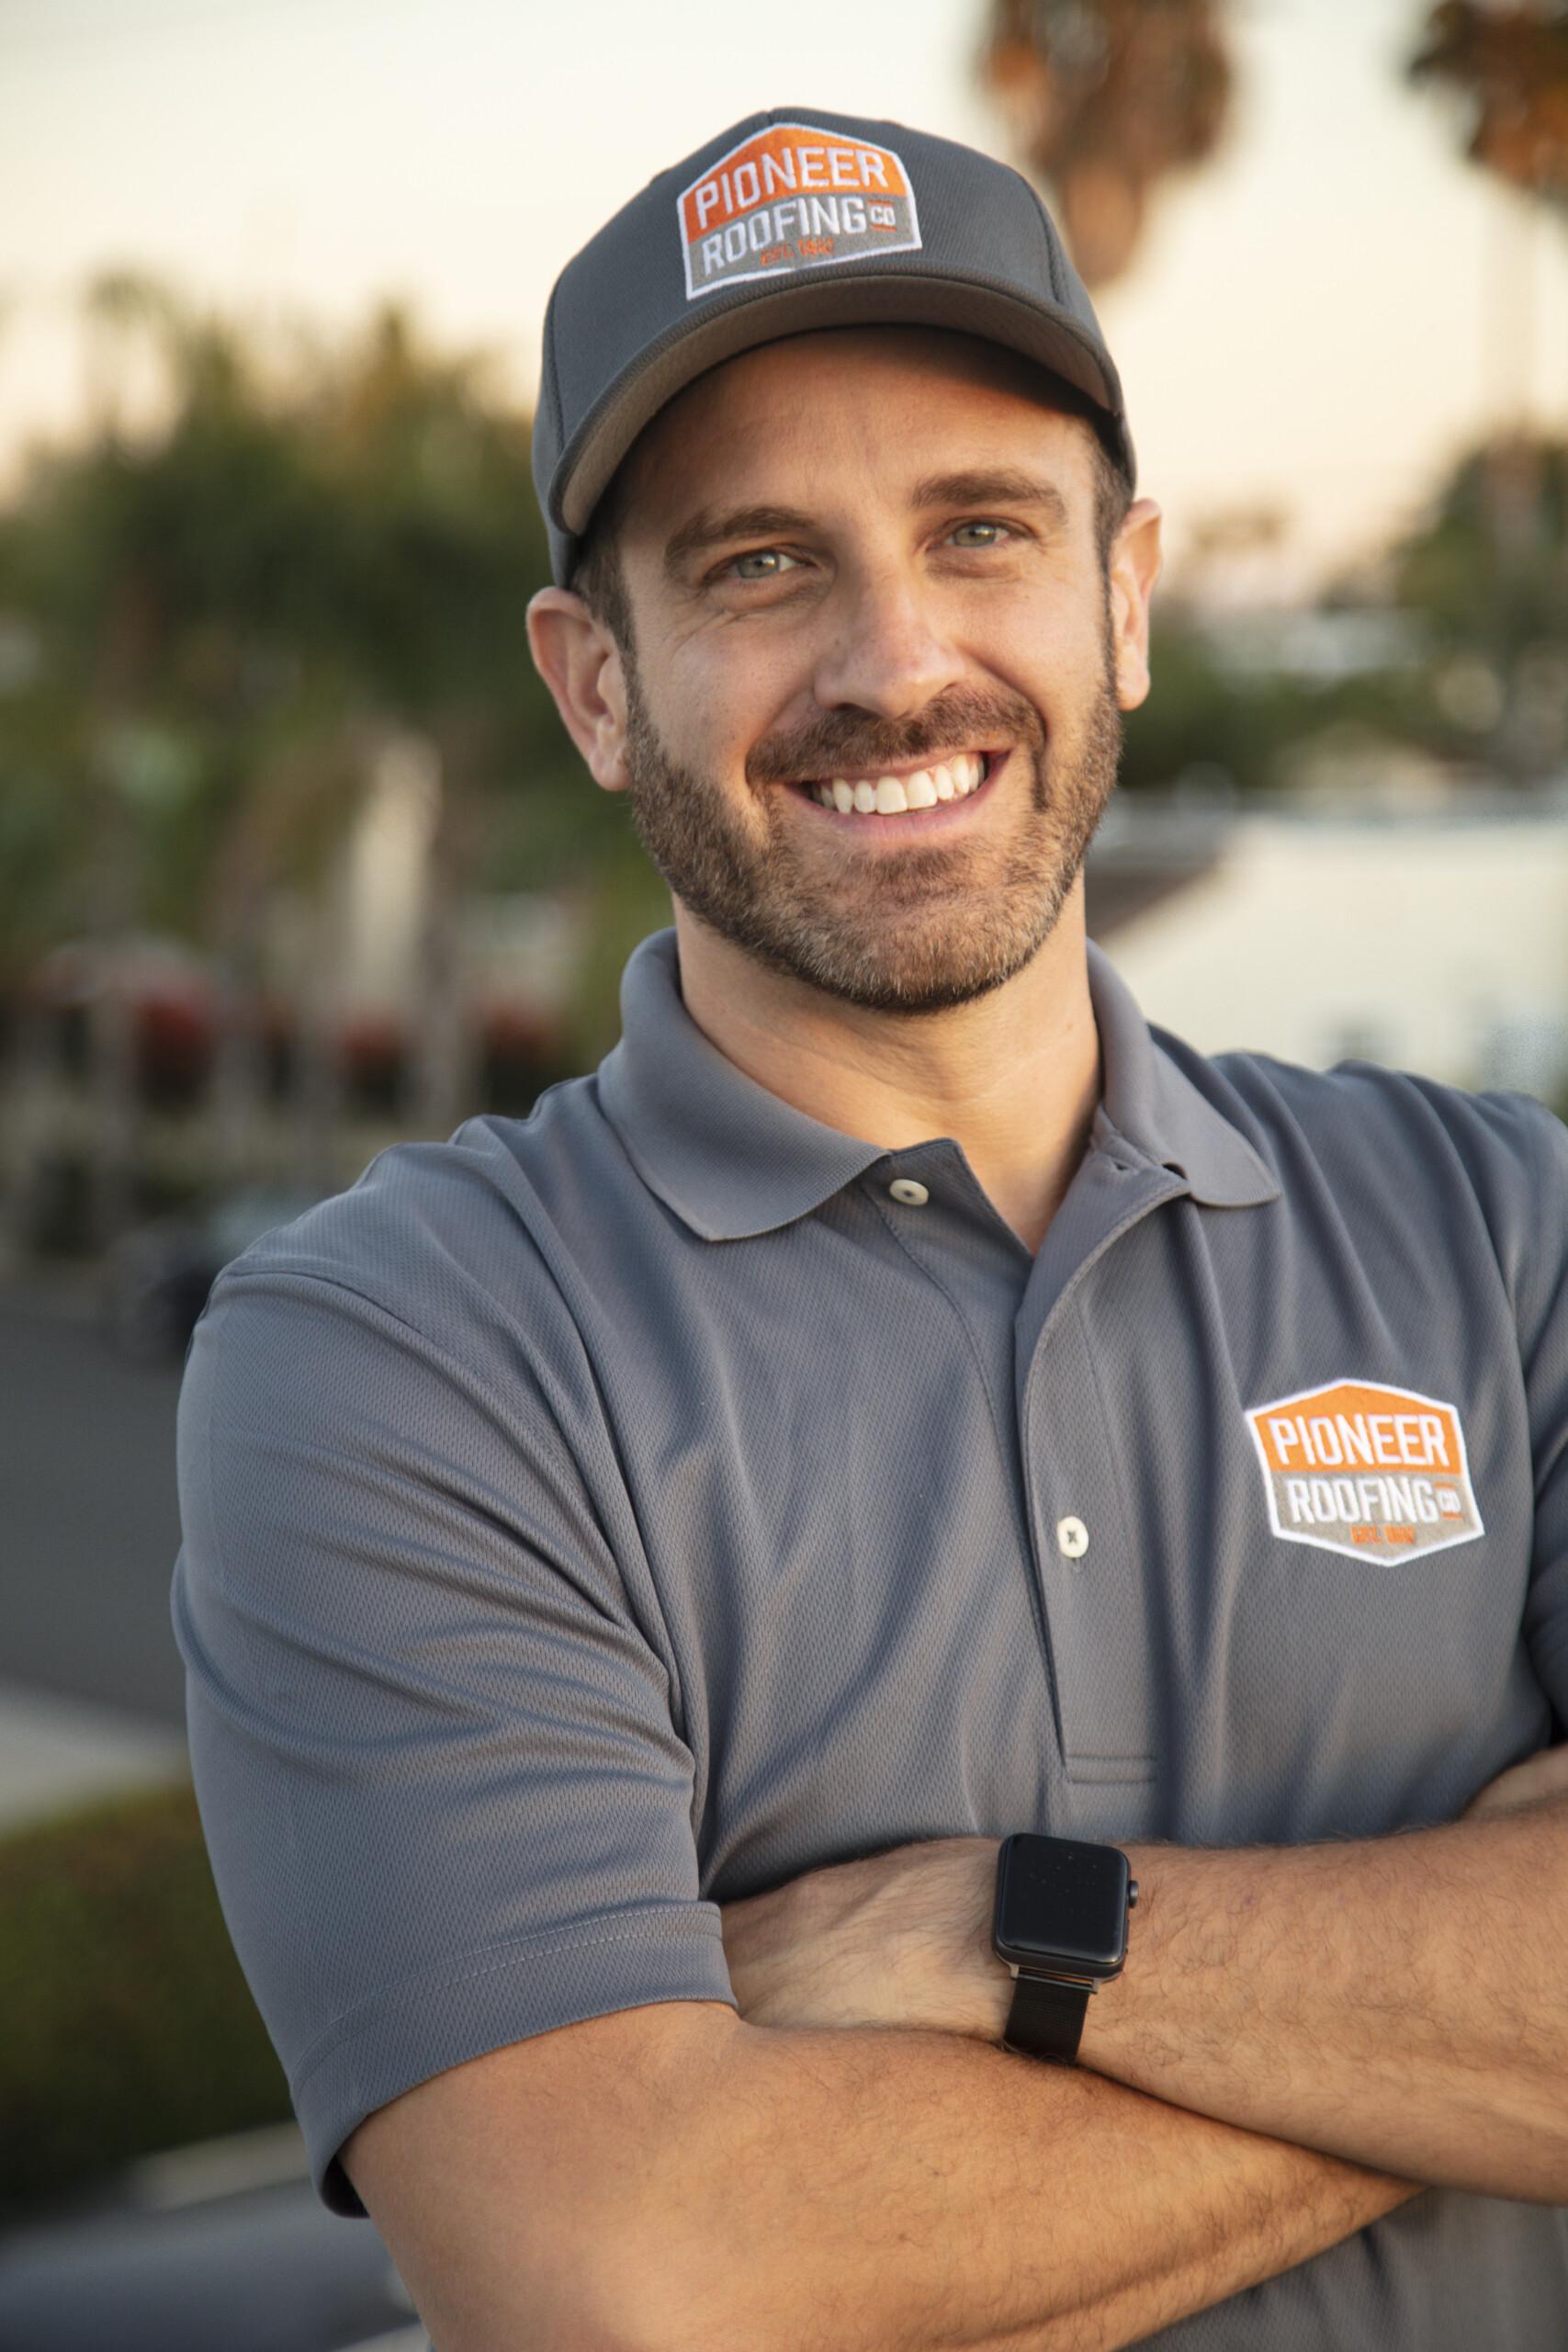 Dustin Resser Owner of Pioneer Roofing